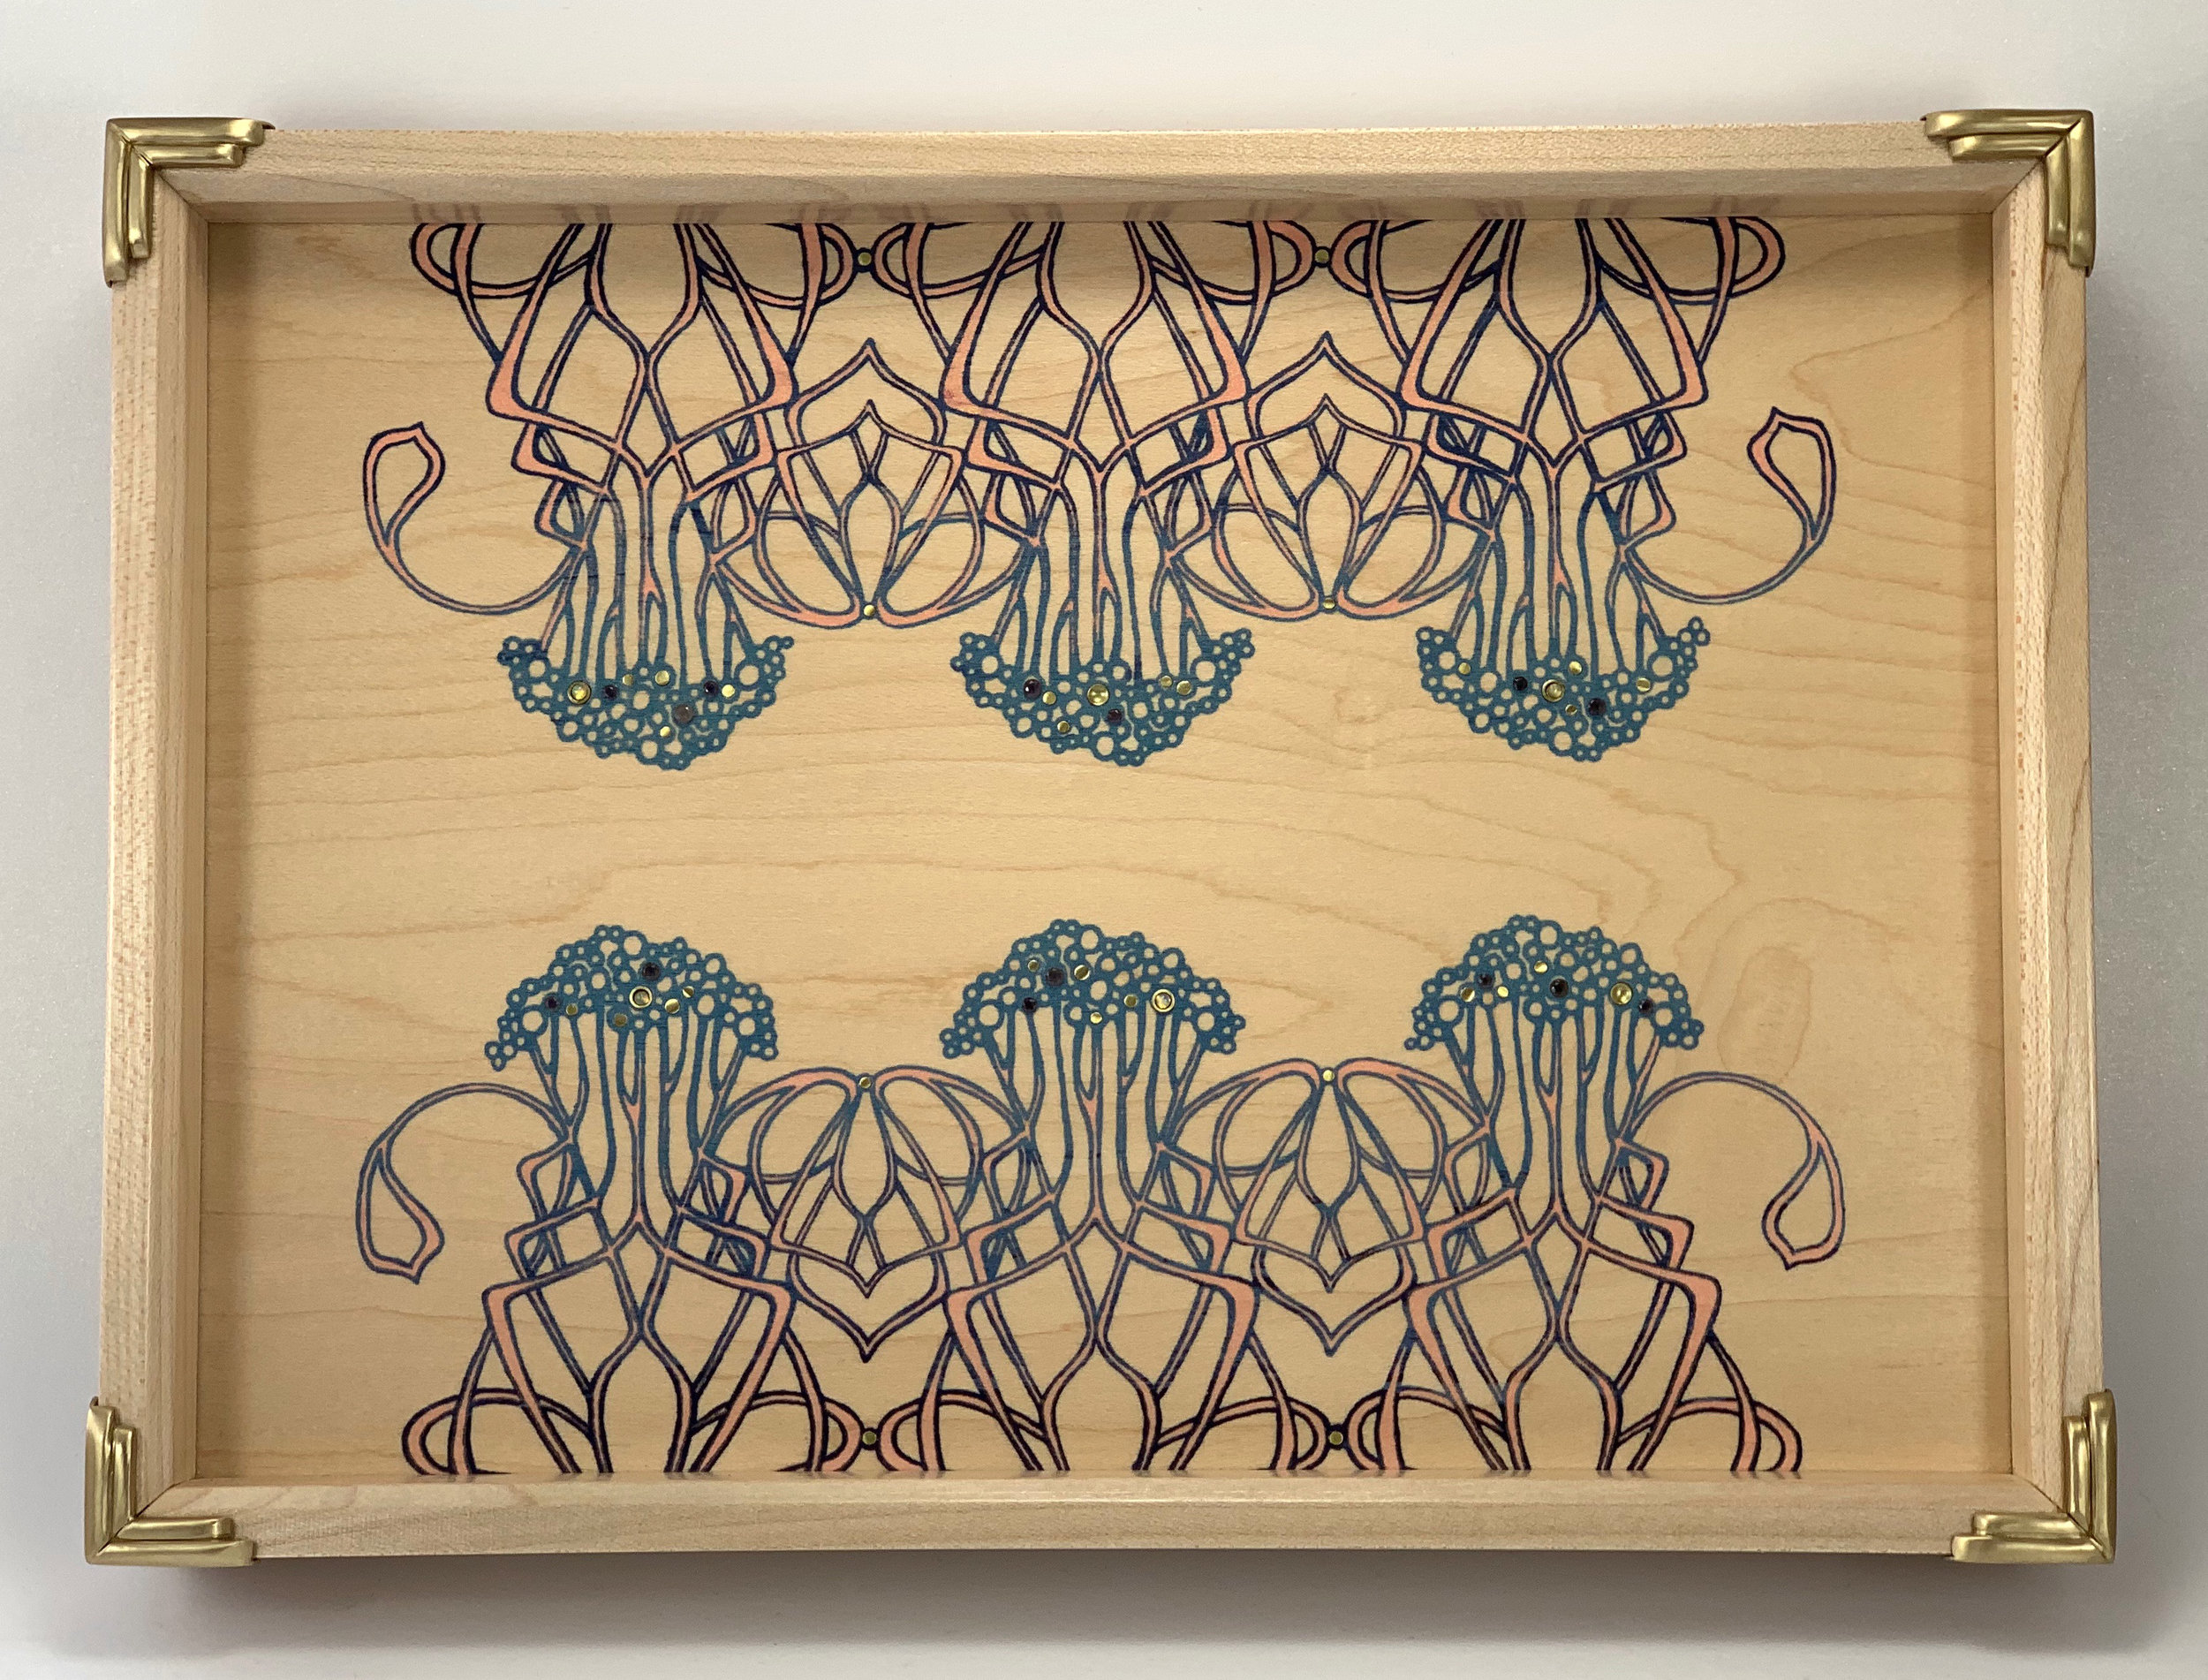 "new nouveau  tray, maple, 12"" x 12"" x 1.25"", brass, turquoise, chrysoprase, white topaz, aquamarine, London blue topaz, and opal gemstones"